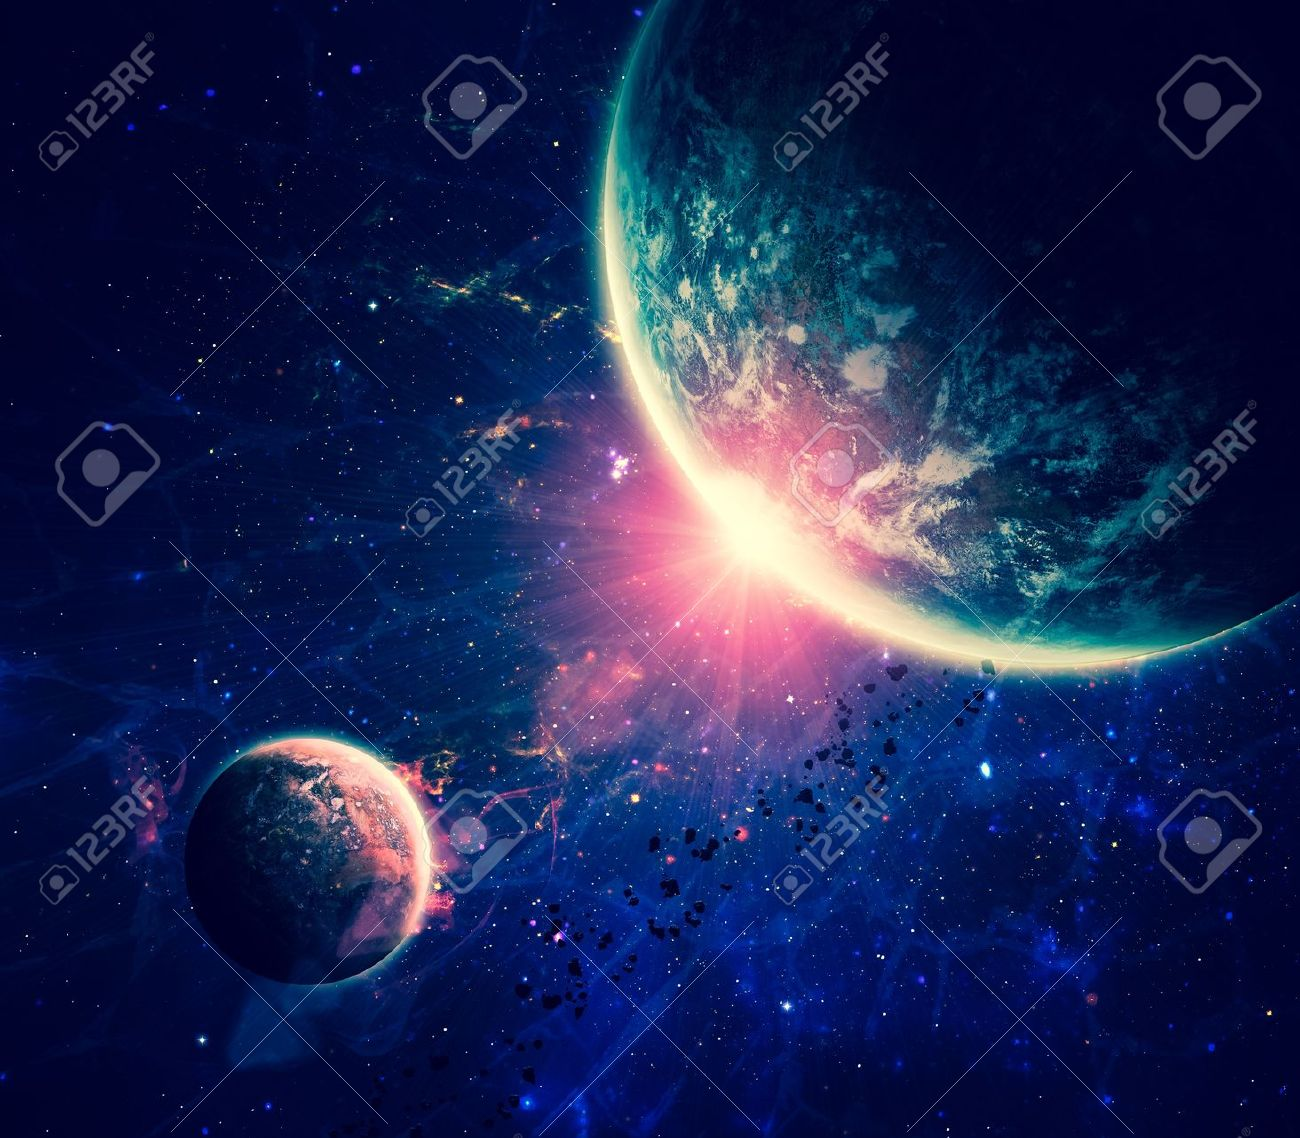 Beautiful Space Background Stock Photo